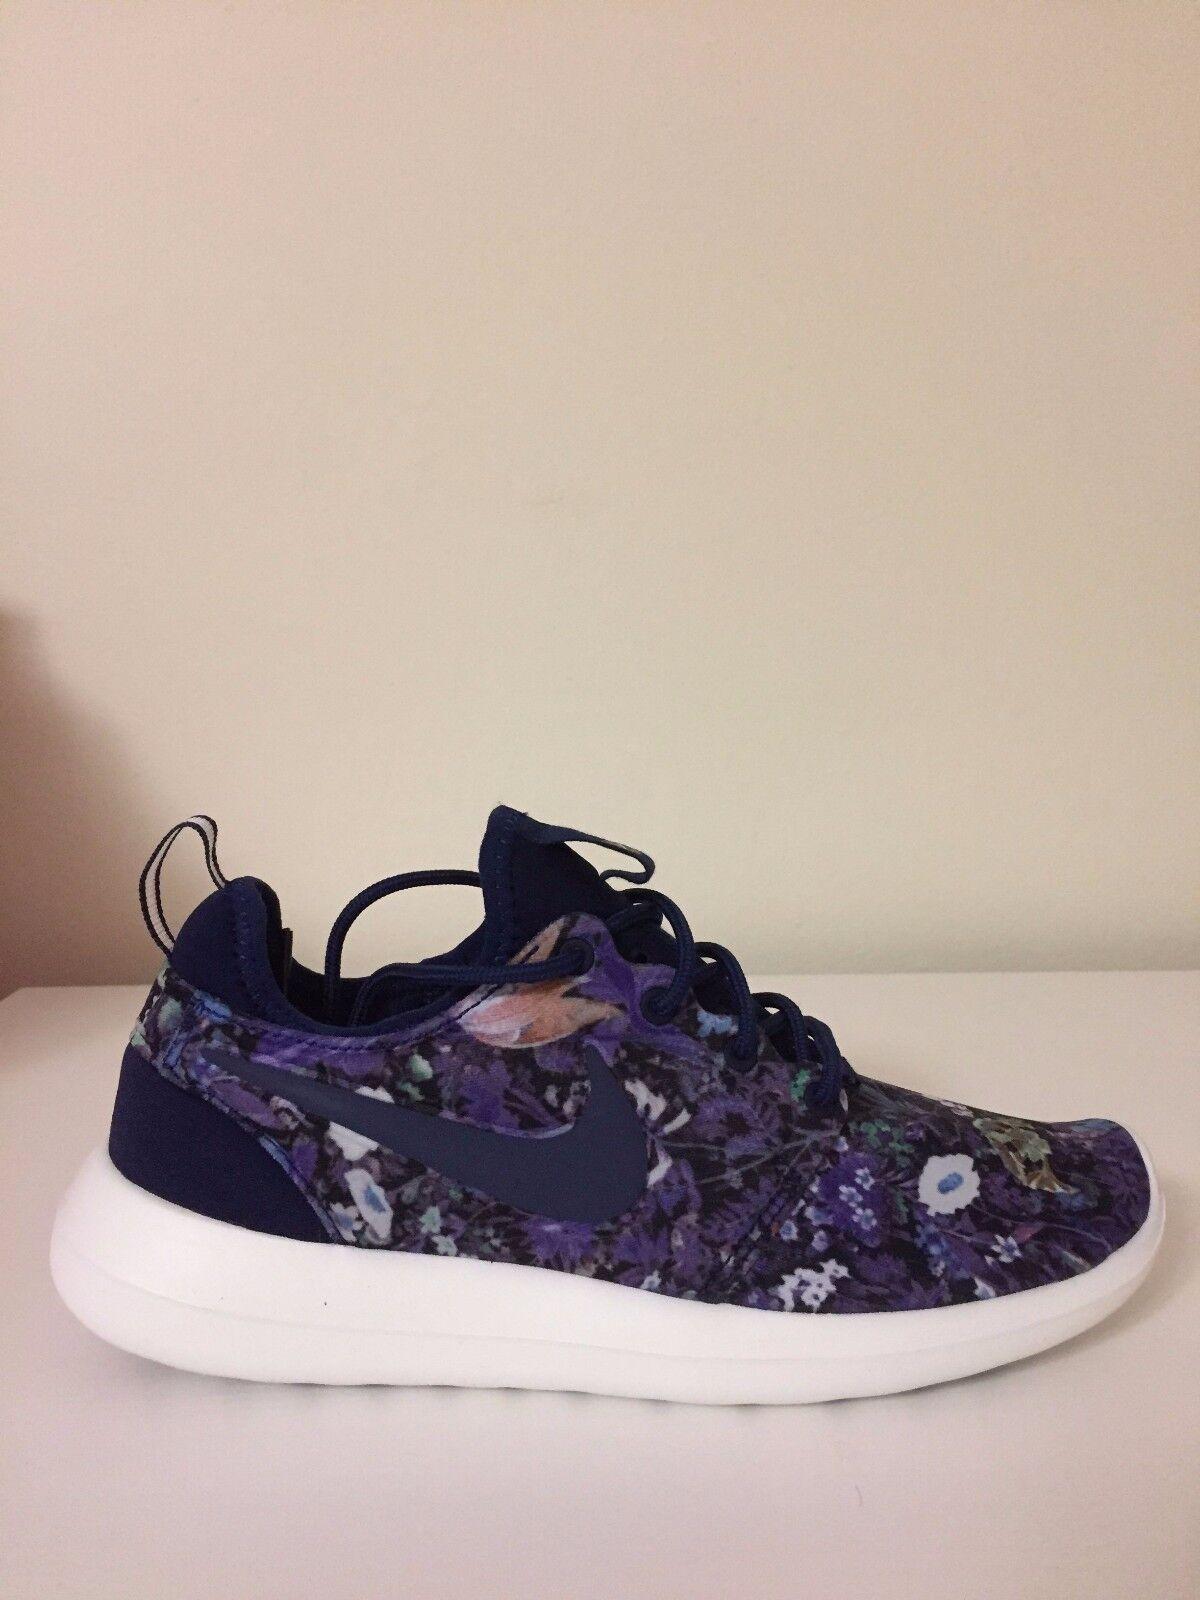 Nike Roshe Two Print Floral Binary Blue 844933-403 Wmn Sz 6.5